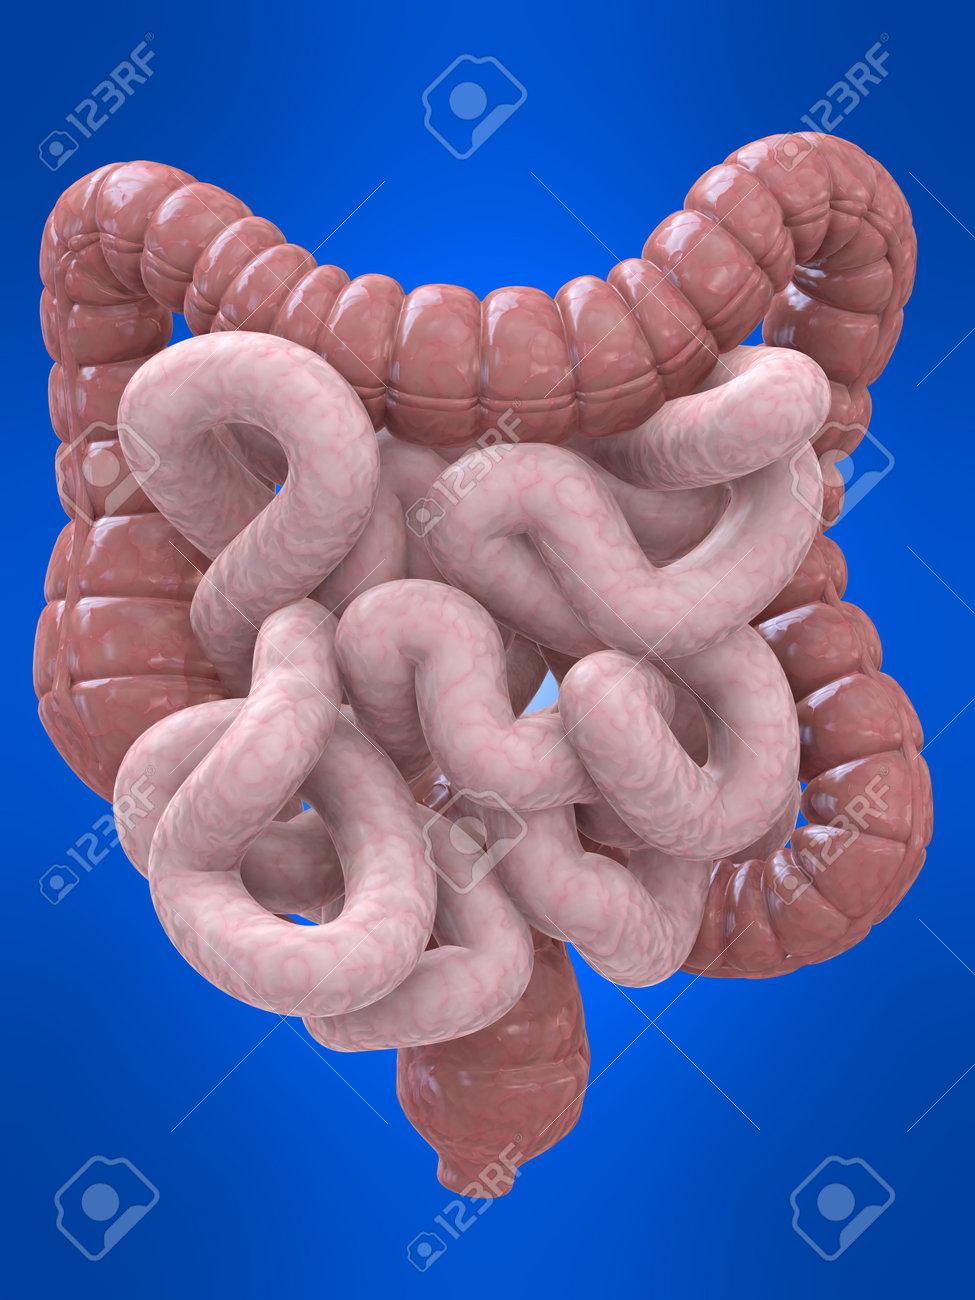 colon and intestines Stock Photo - 4696074